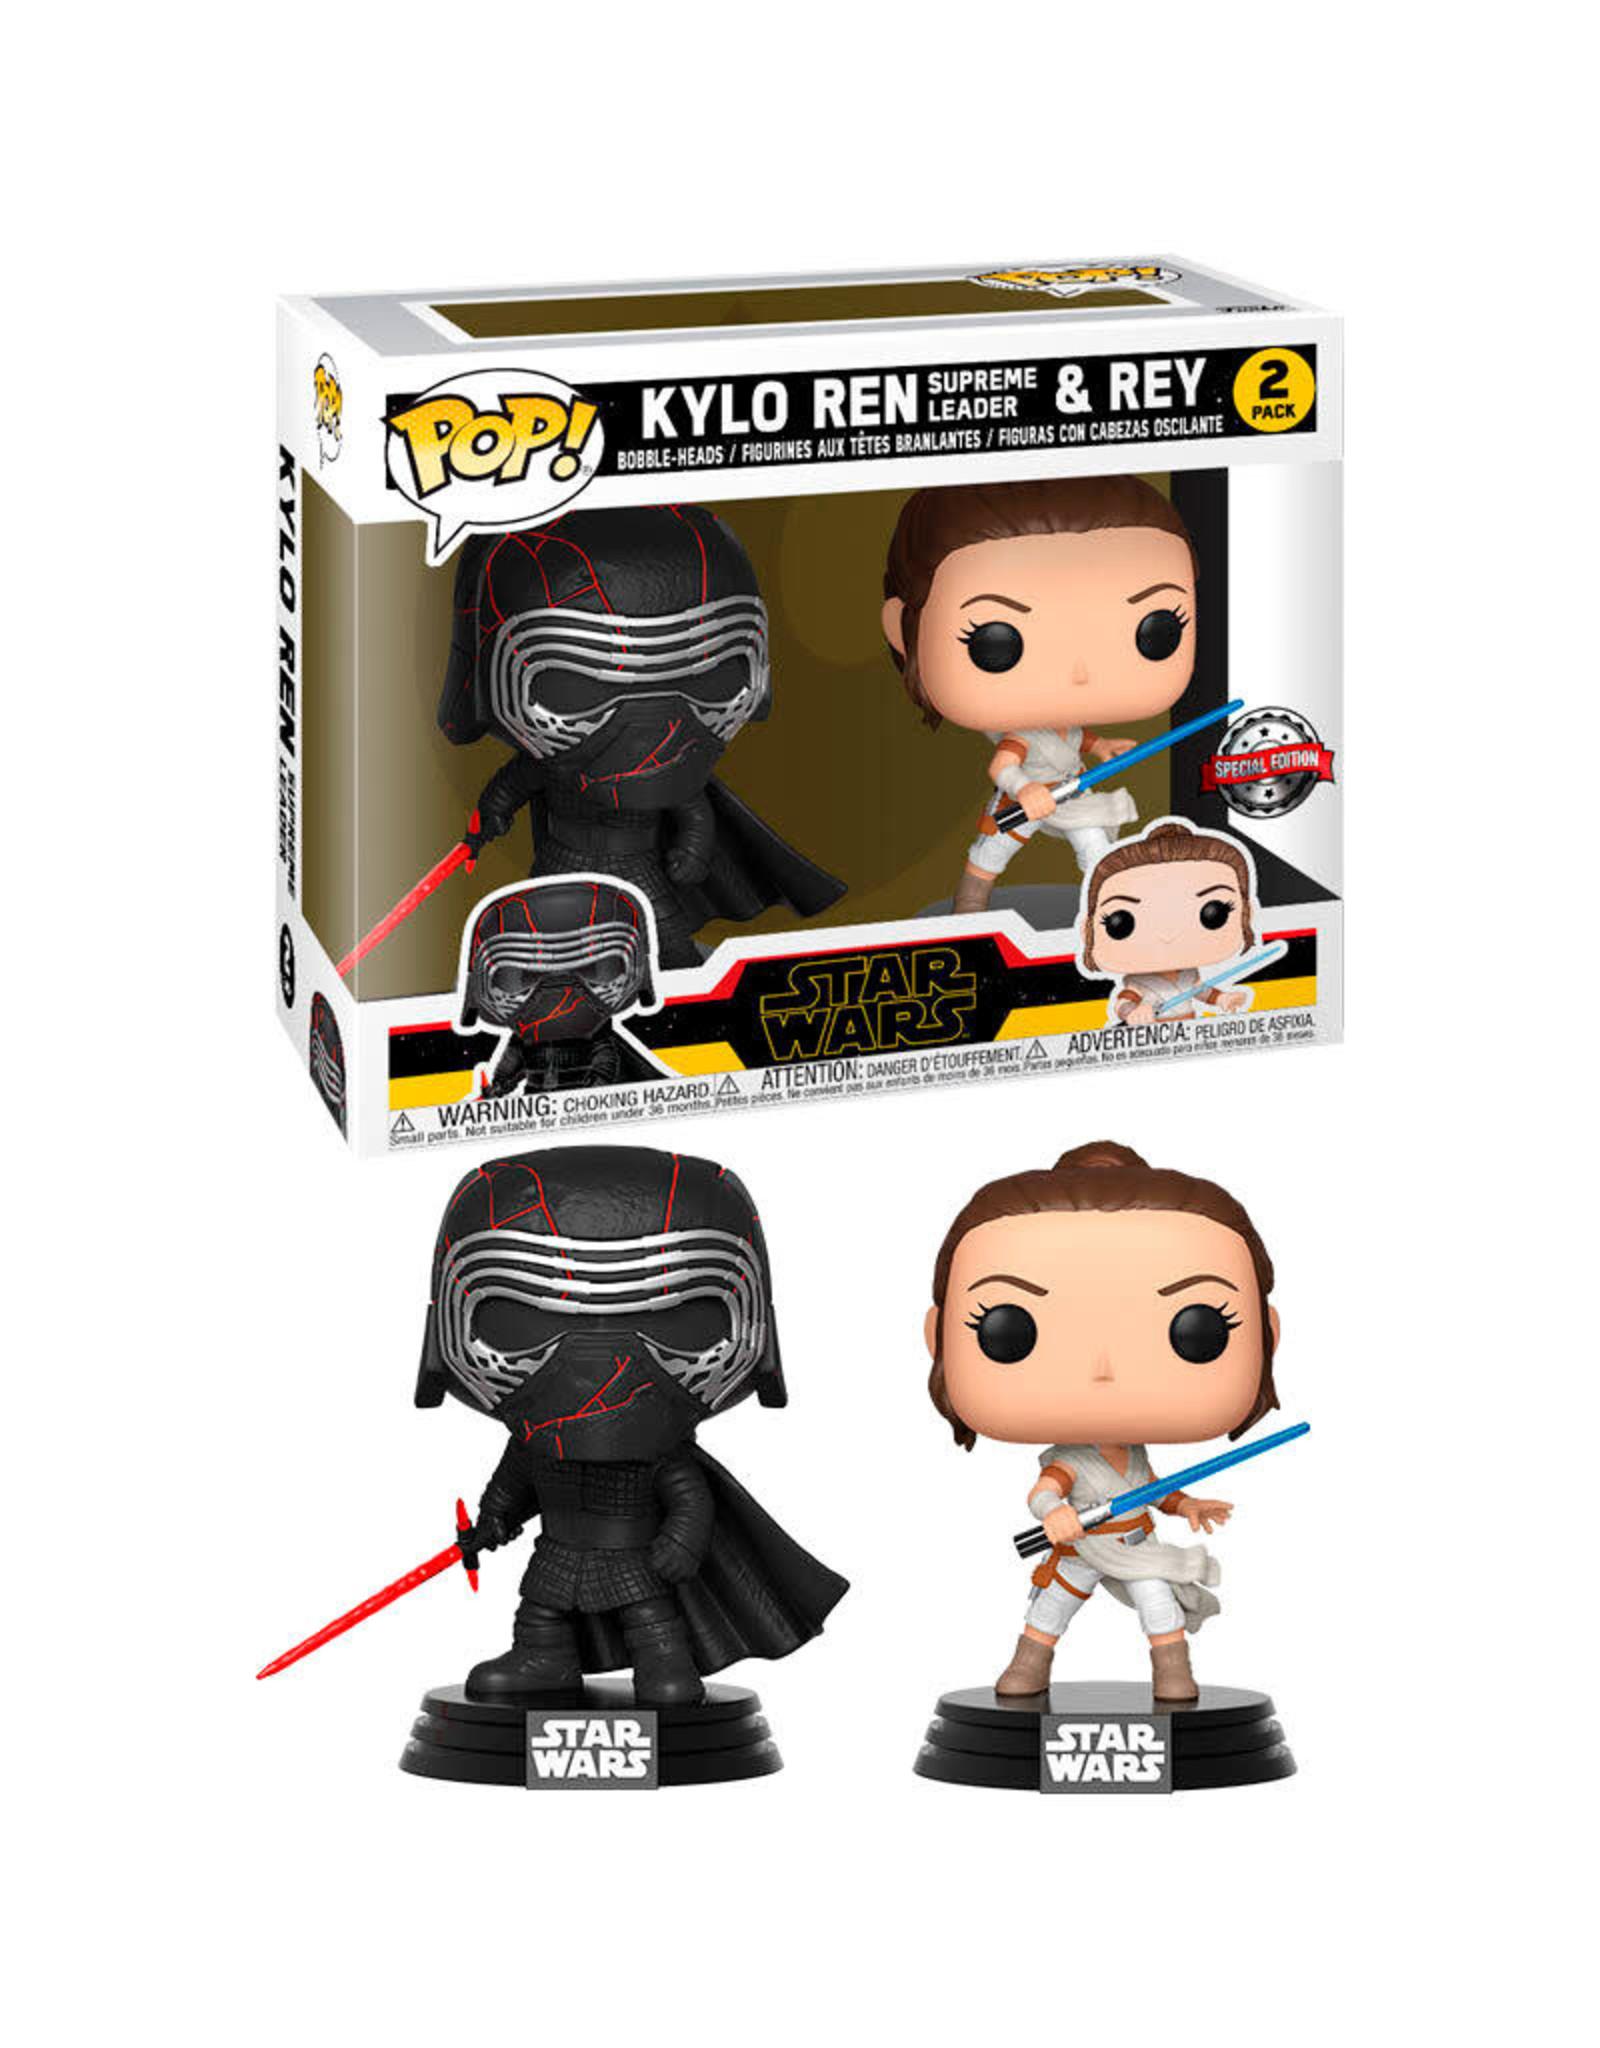 Funko STAR WARS Rise of Skywalker 2-Pack POP! - Kylo and Rey Exclusive